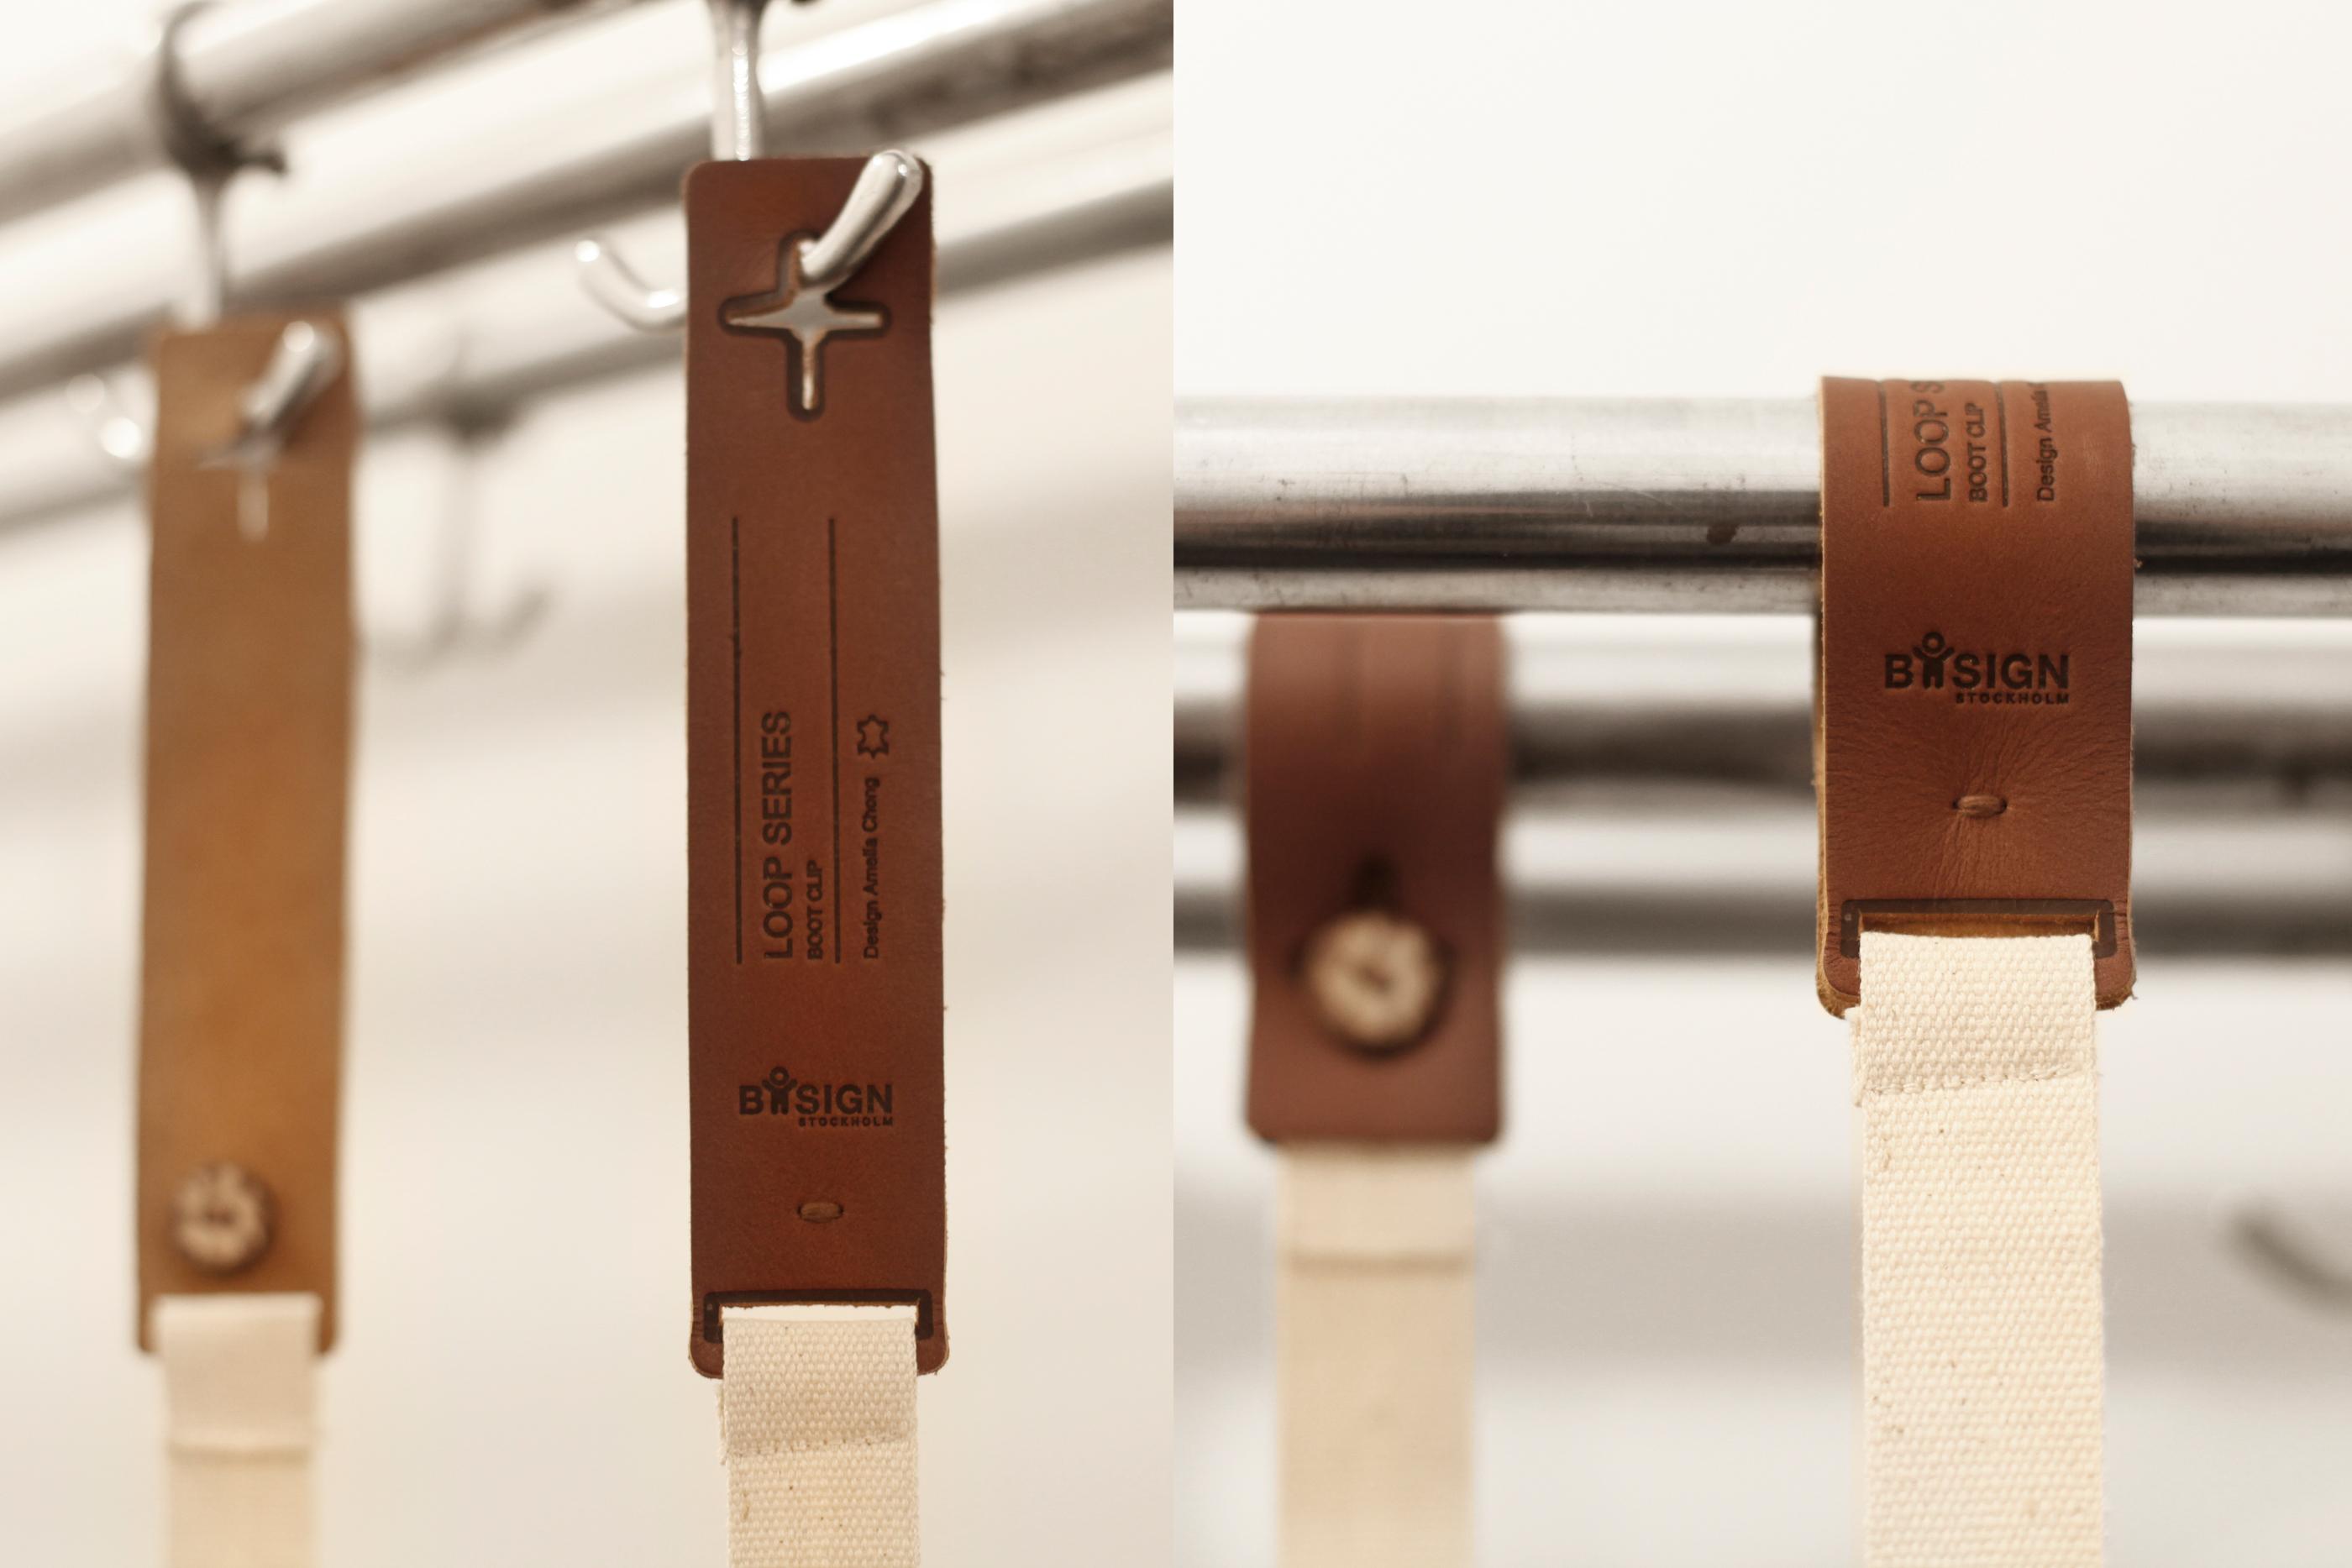 Stövelhållare Loop Poleradmörkgråbrowngräddvit. 4x1x100